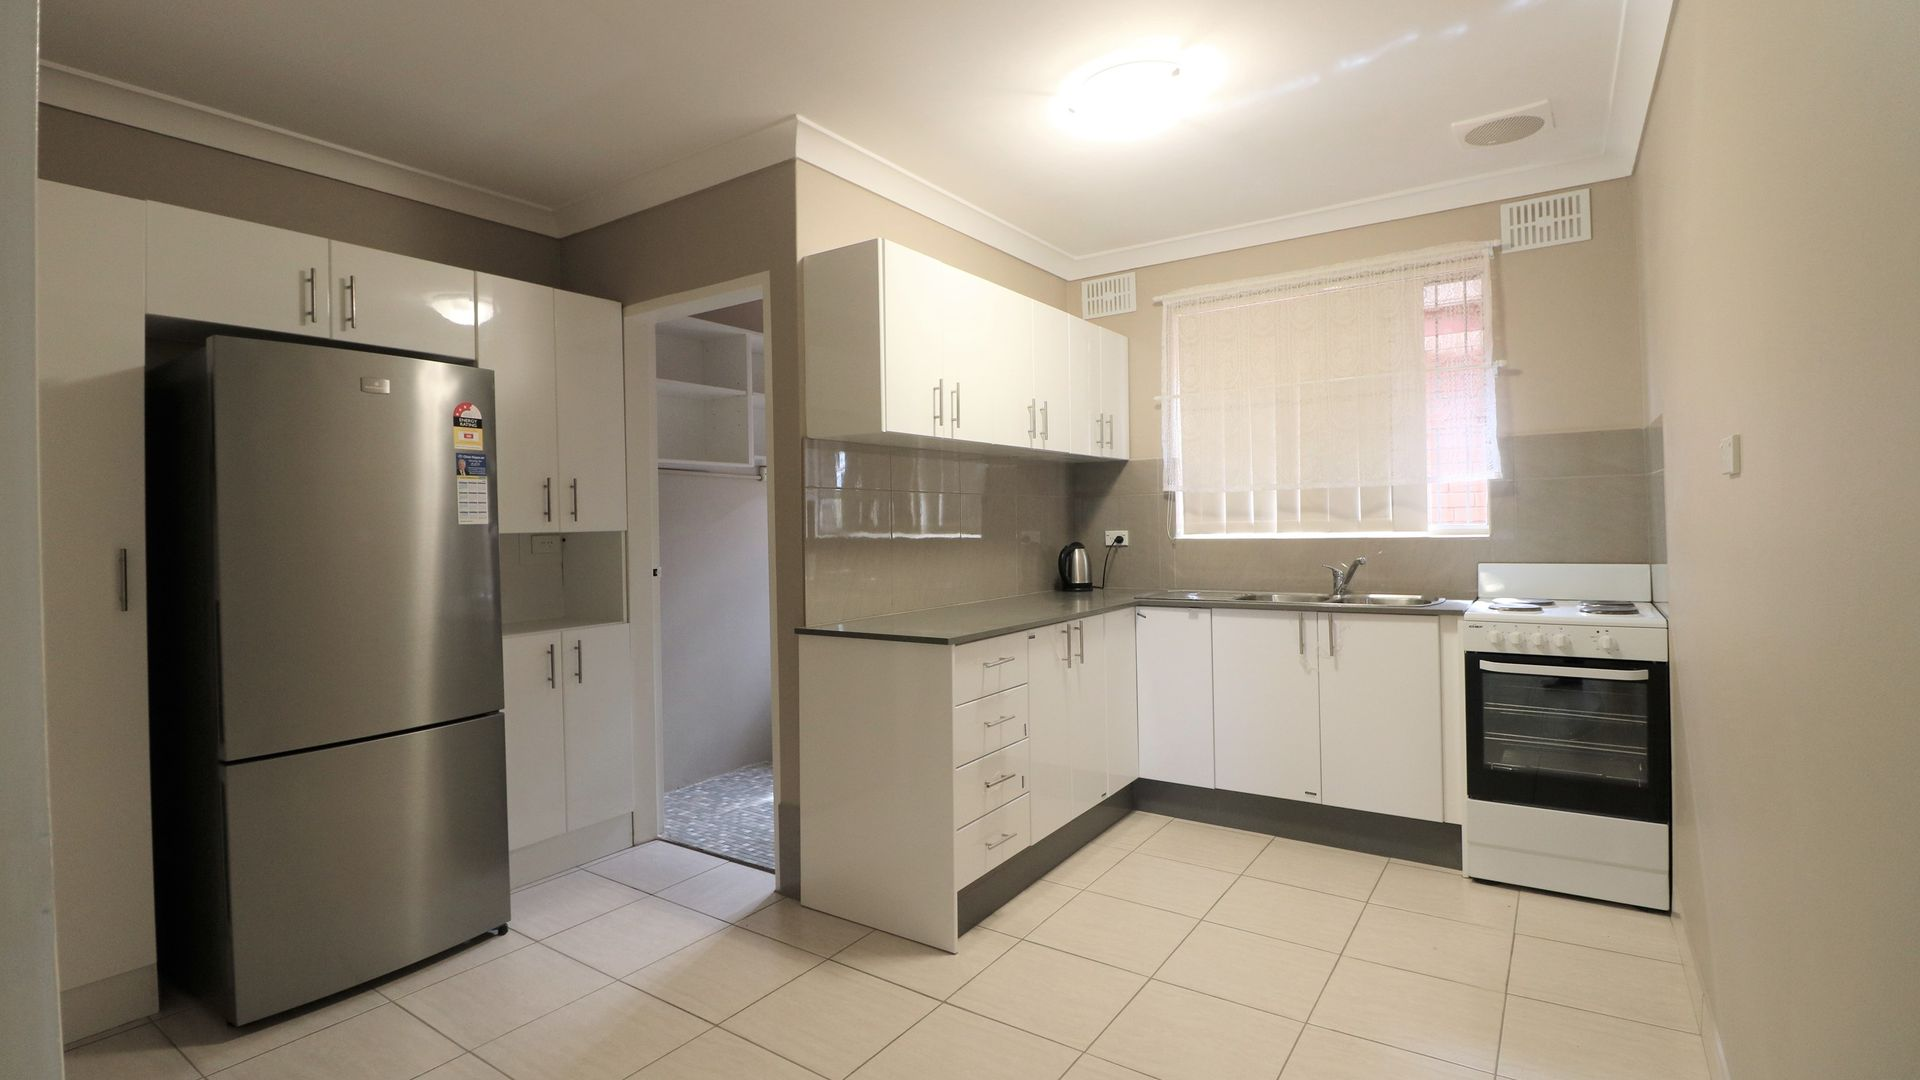 9/108 Broomfield street, Cabramatta NSW 2166, Image 2